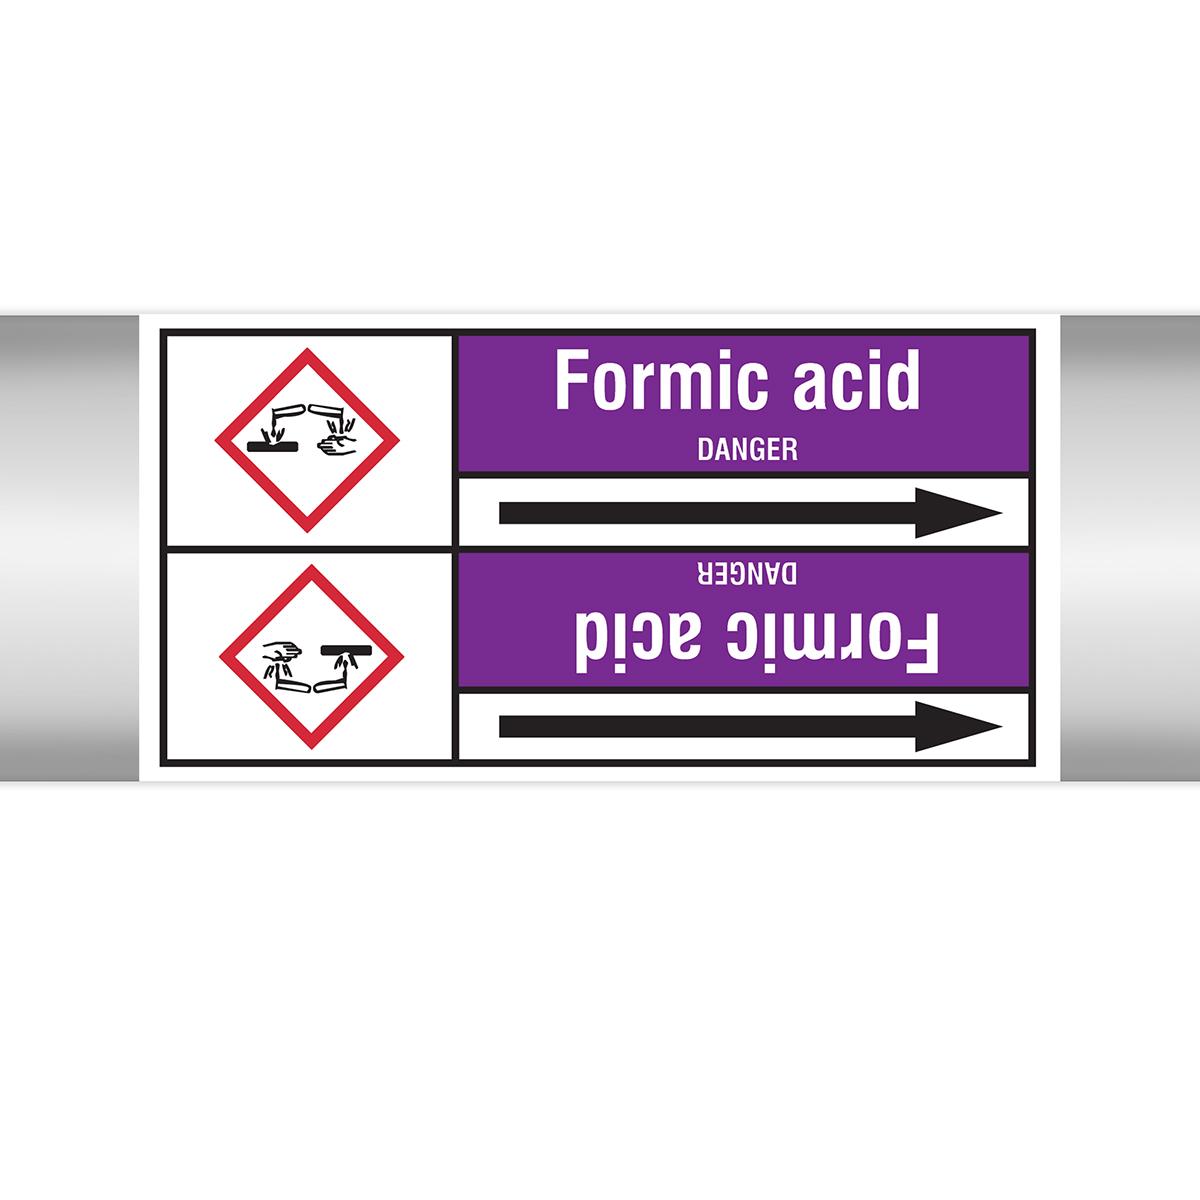 Roll Form Liner-less Type 2 - Formic Acid